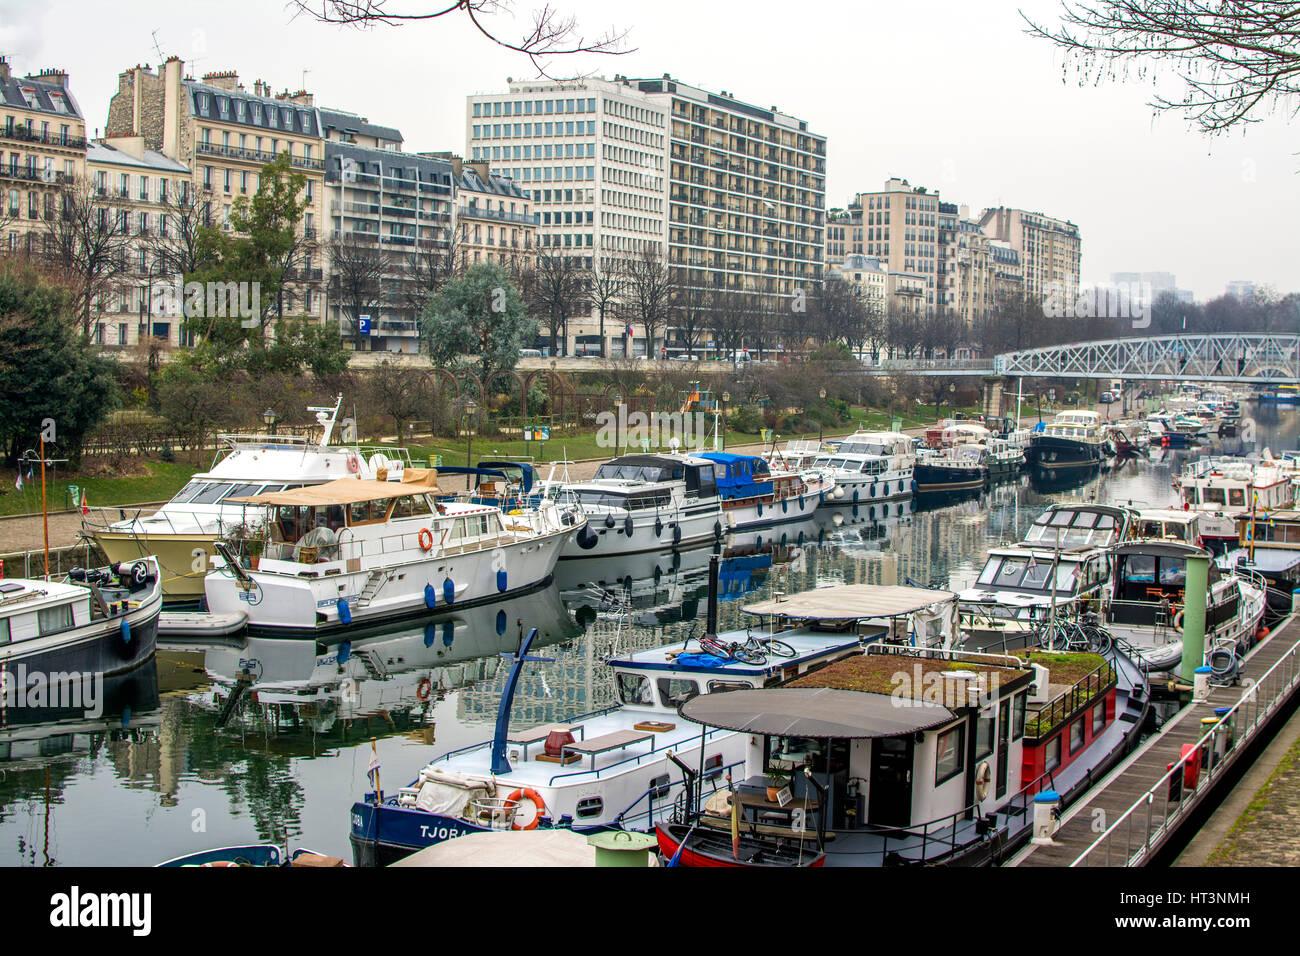 Paris 75 4e arr port de l 39 arsenal ou bassin de l - Port de l arsenal paris ...